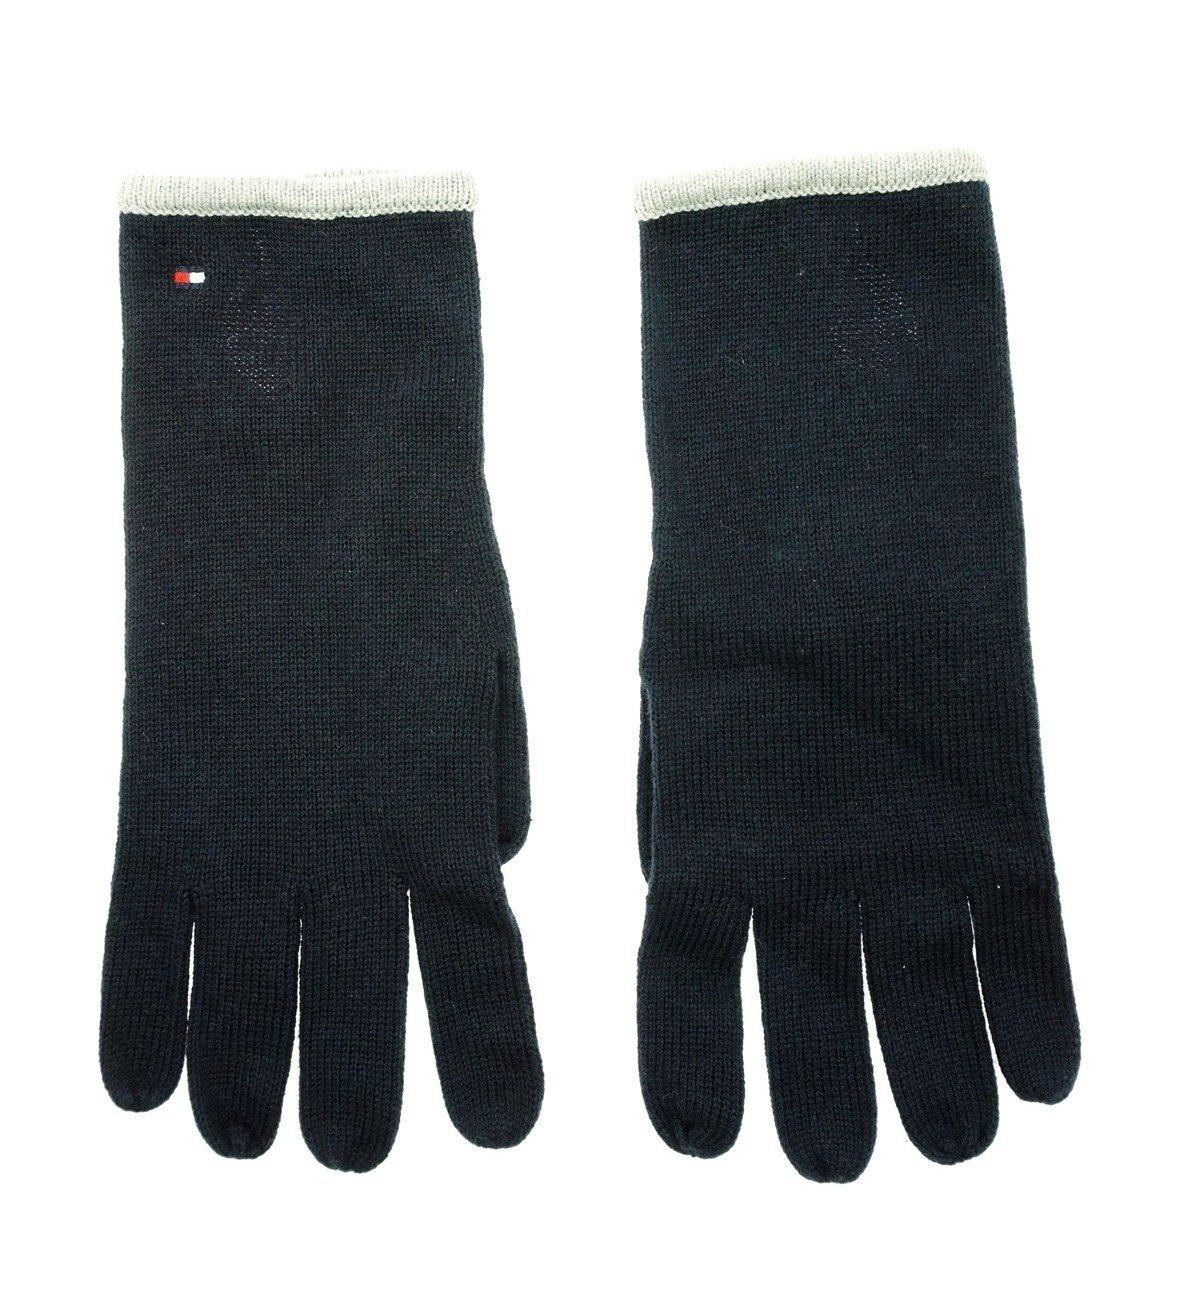 TOMMY HILFIGER Damen Women Set Handschuhe Gloves Schal Scarf DunkelblauGrau